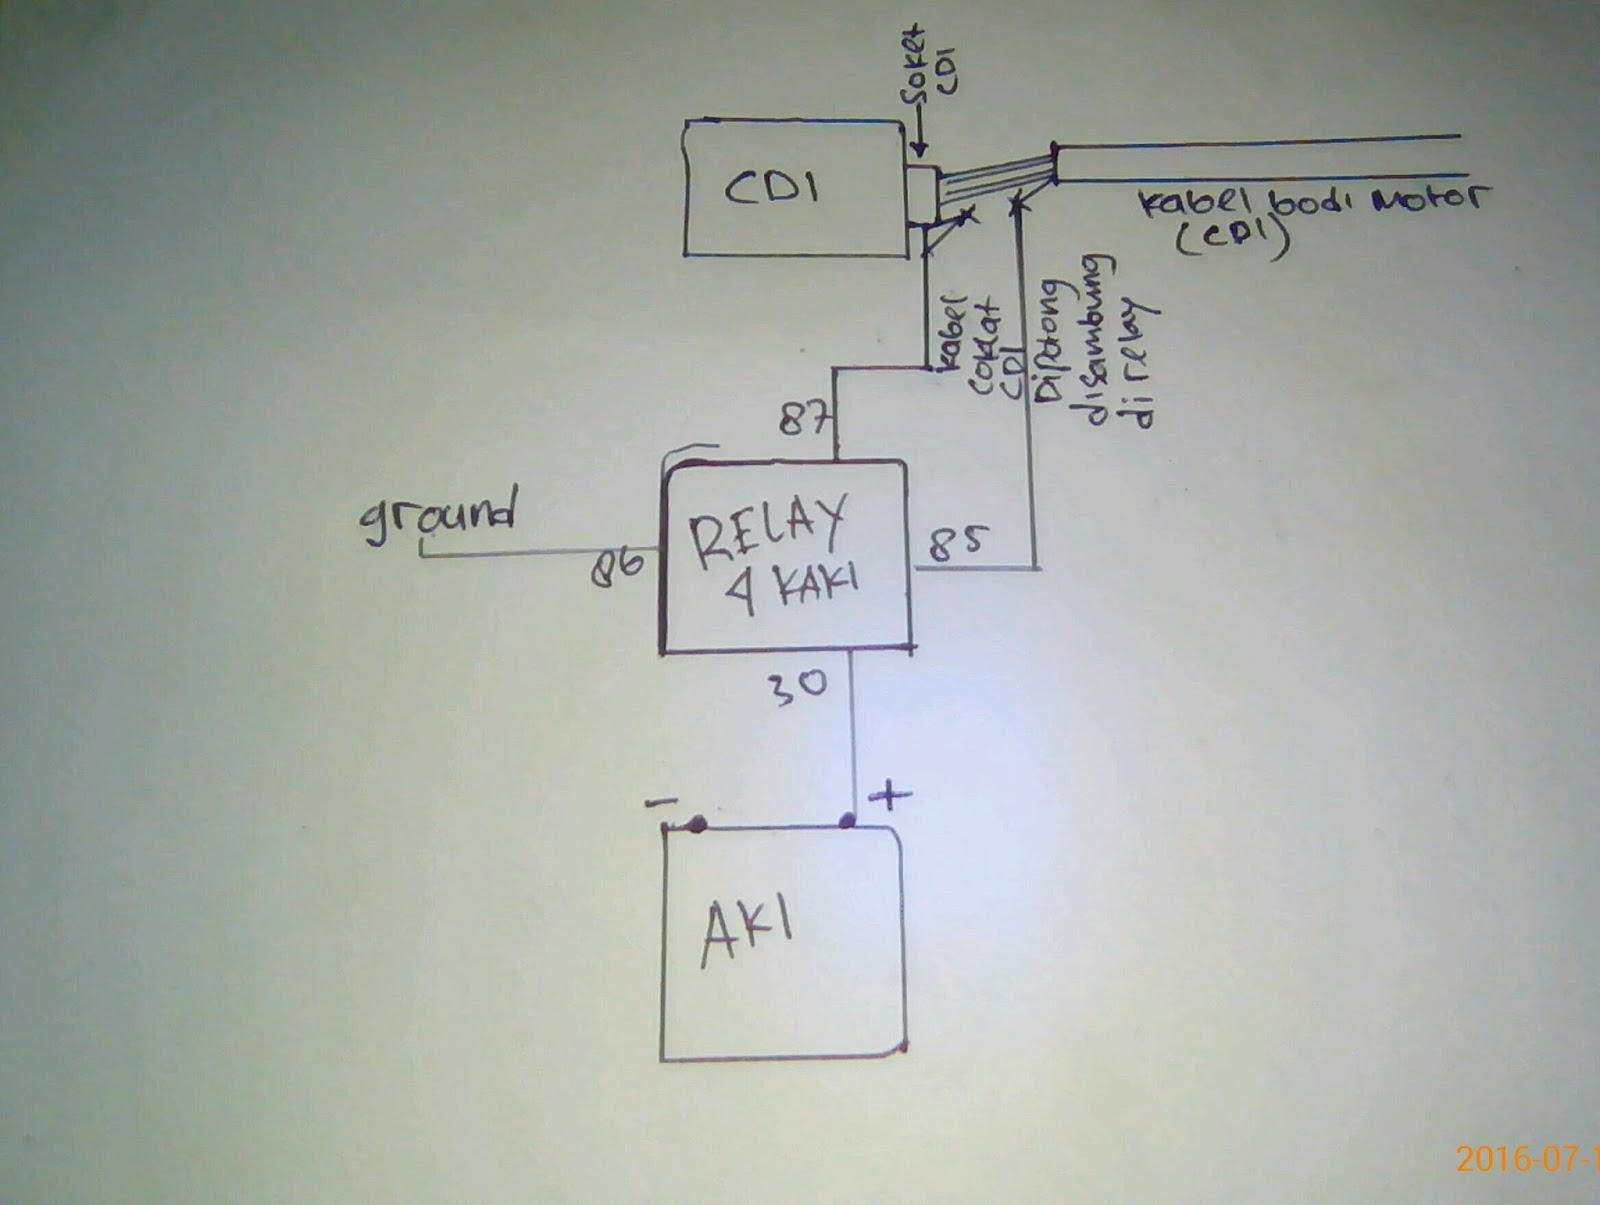 wiring diagram cdi jupiter mx 5zbl fotografiede